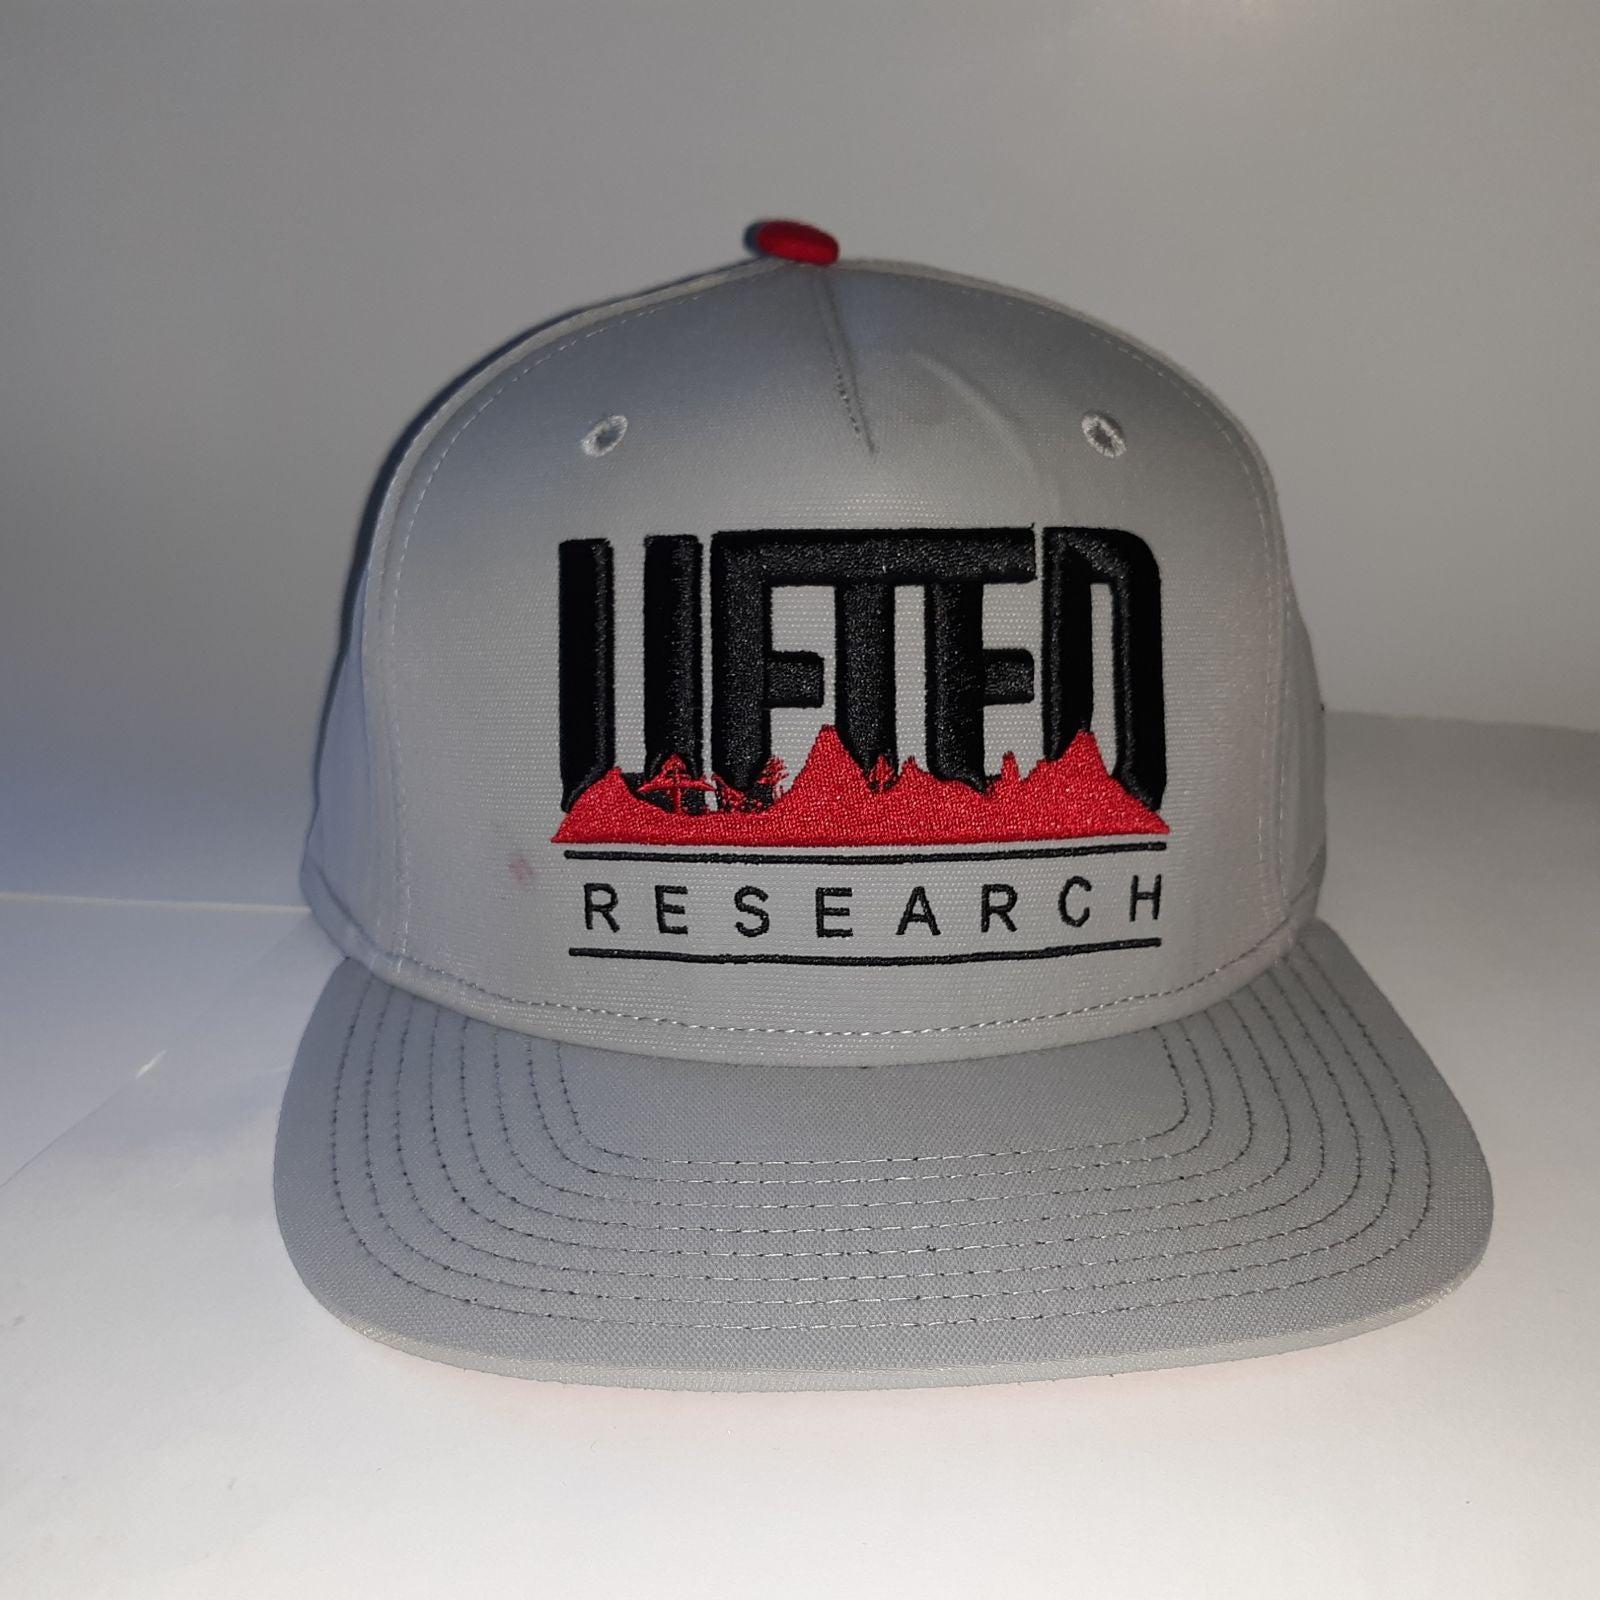 Lrg snapback hat(Gry)